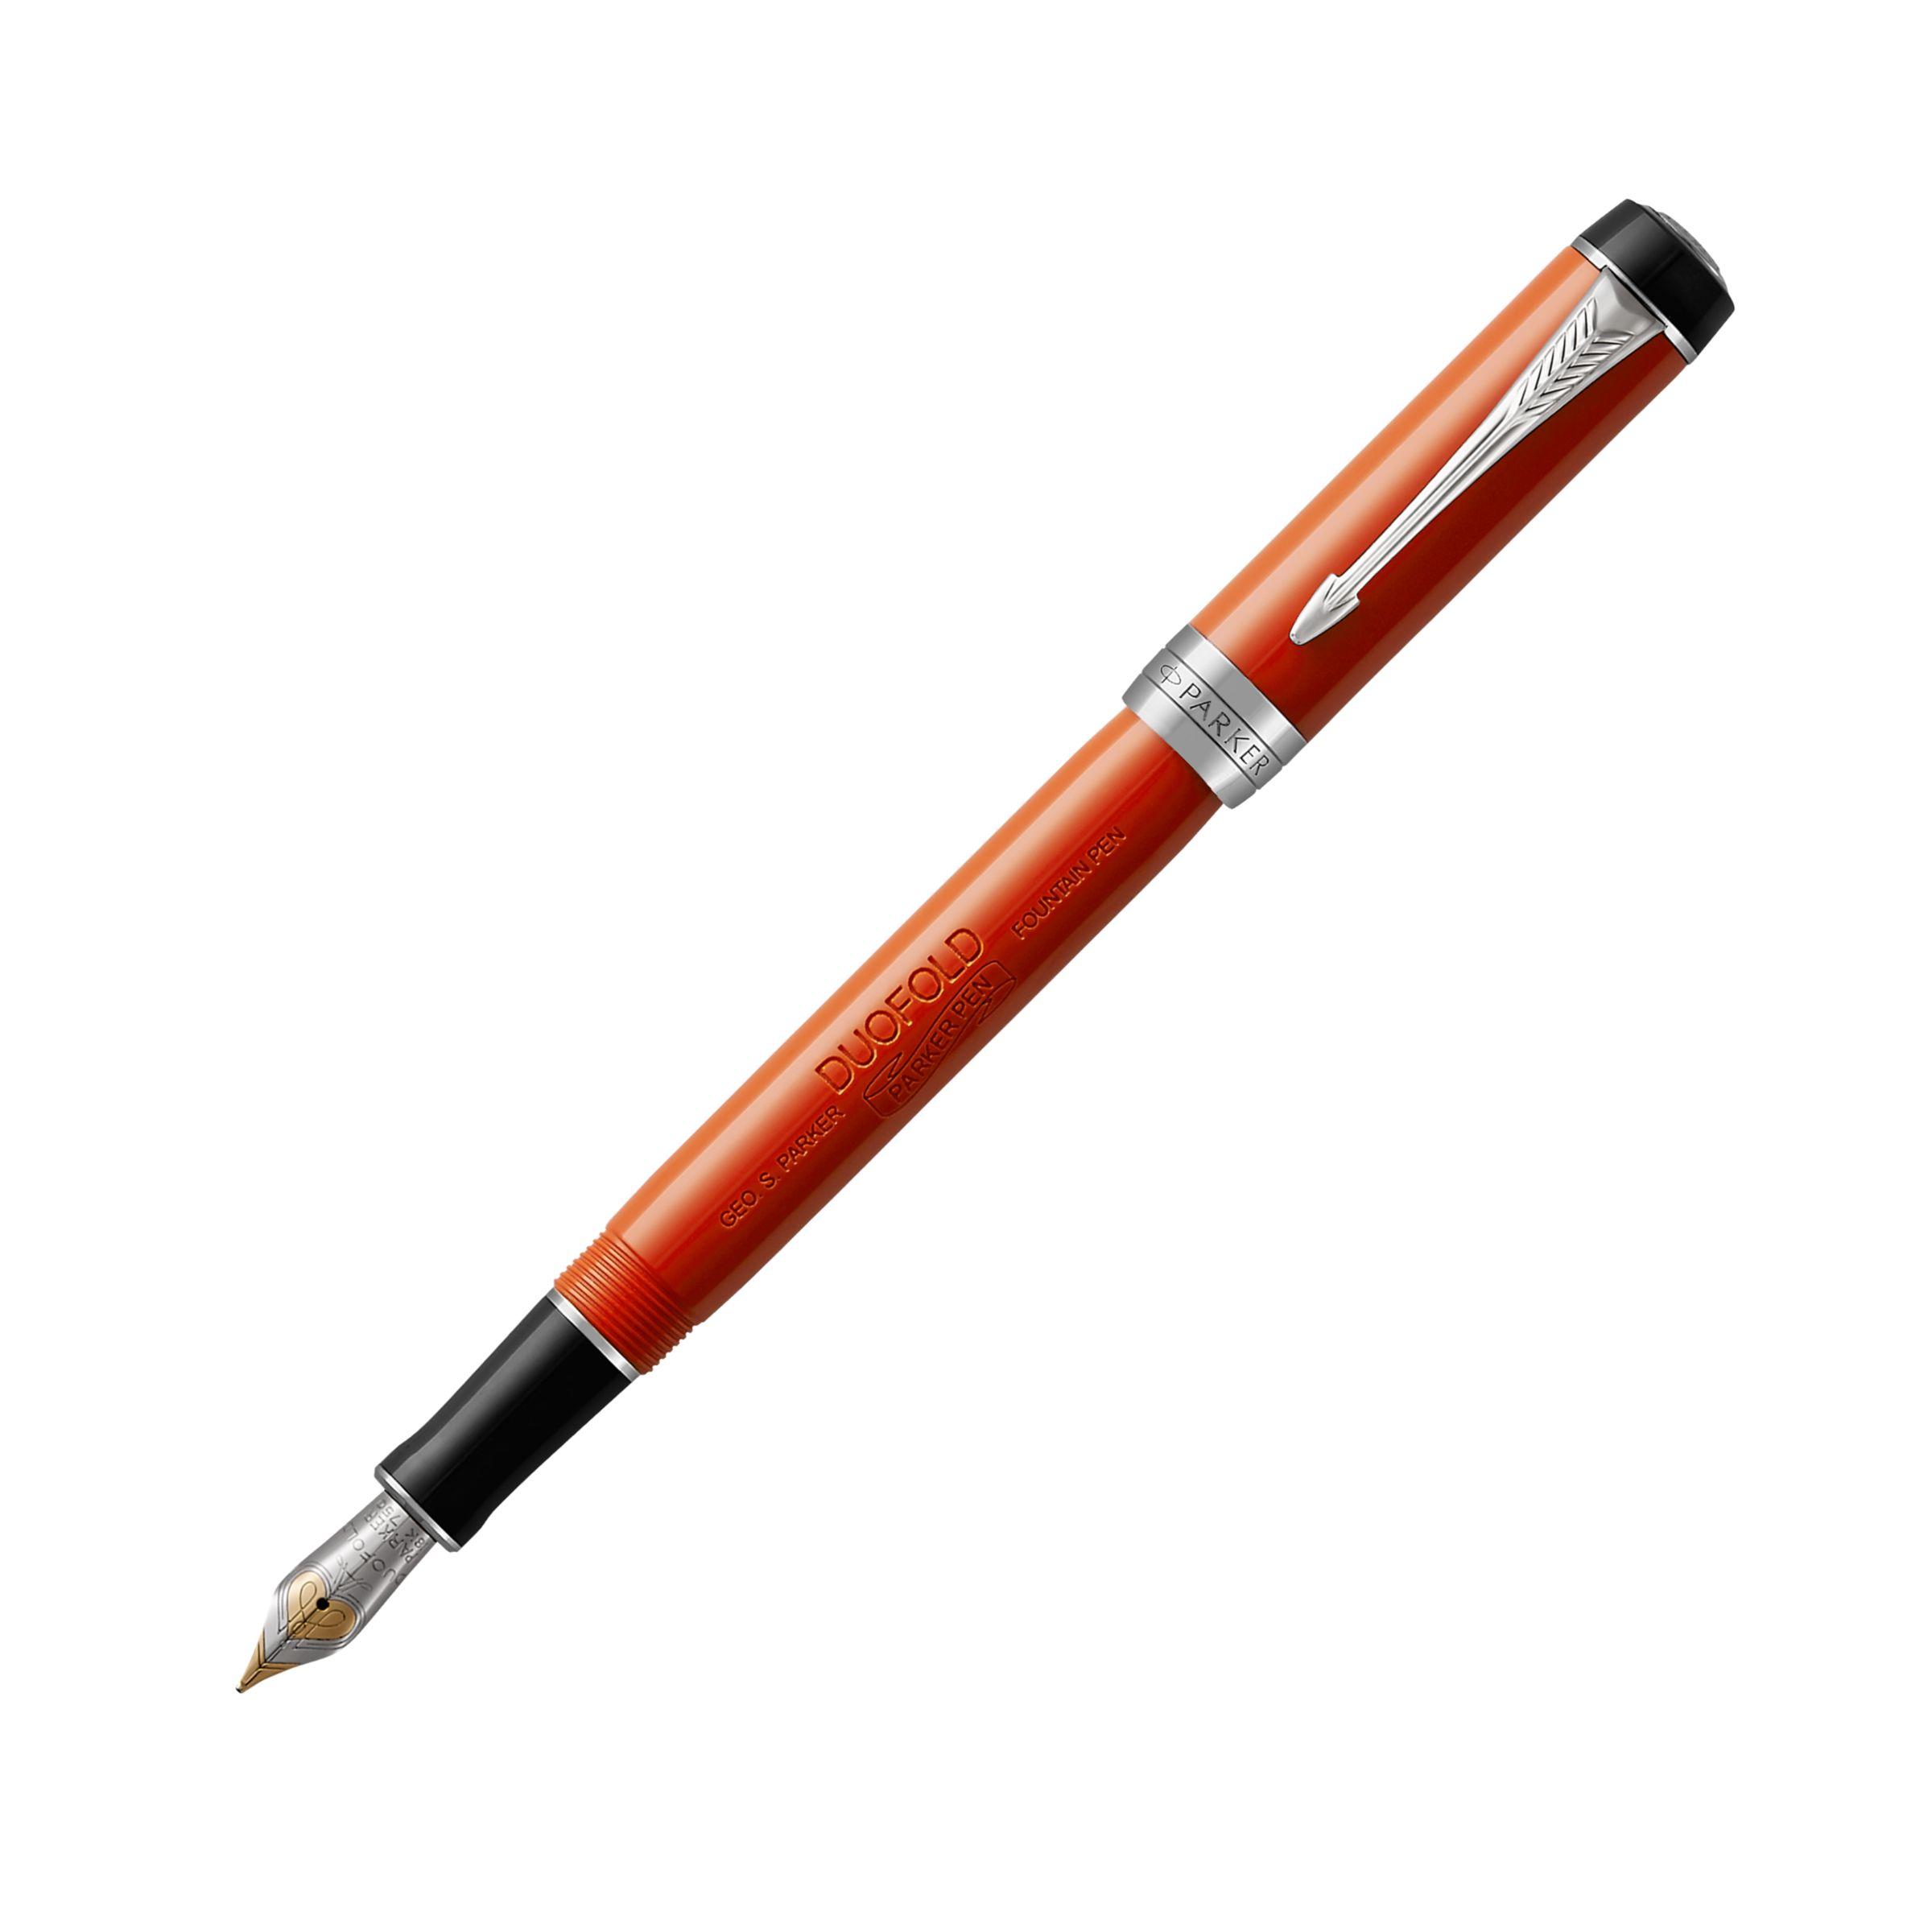 Parker Parker Duofold International Big Red Vintage Fountain Pen